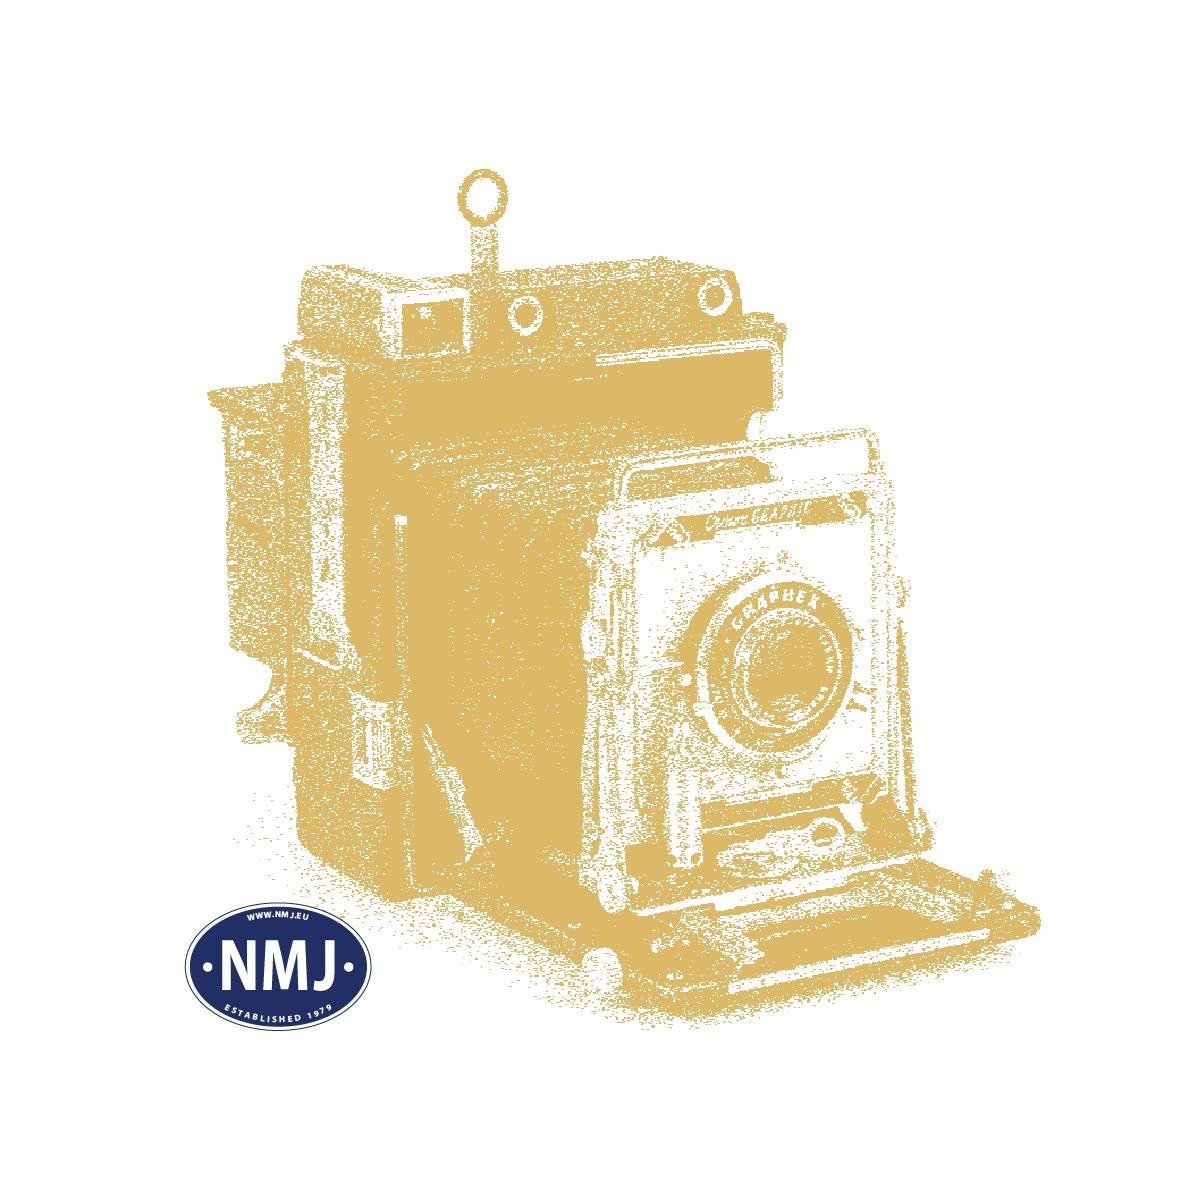 NMJST310962 - NMJ Superline NSB T3 10962 Stakevogn m/ Bremseplattform, *NMJ 40 ÅR*